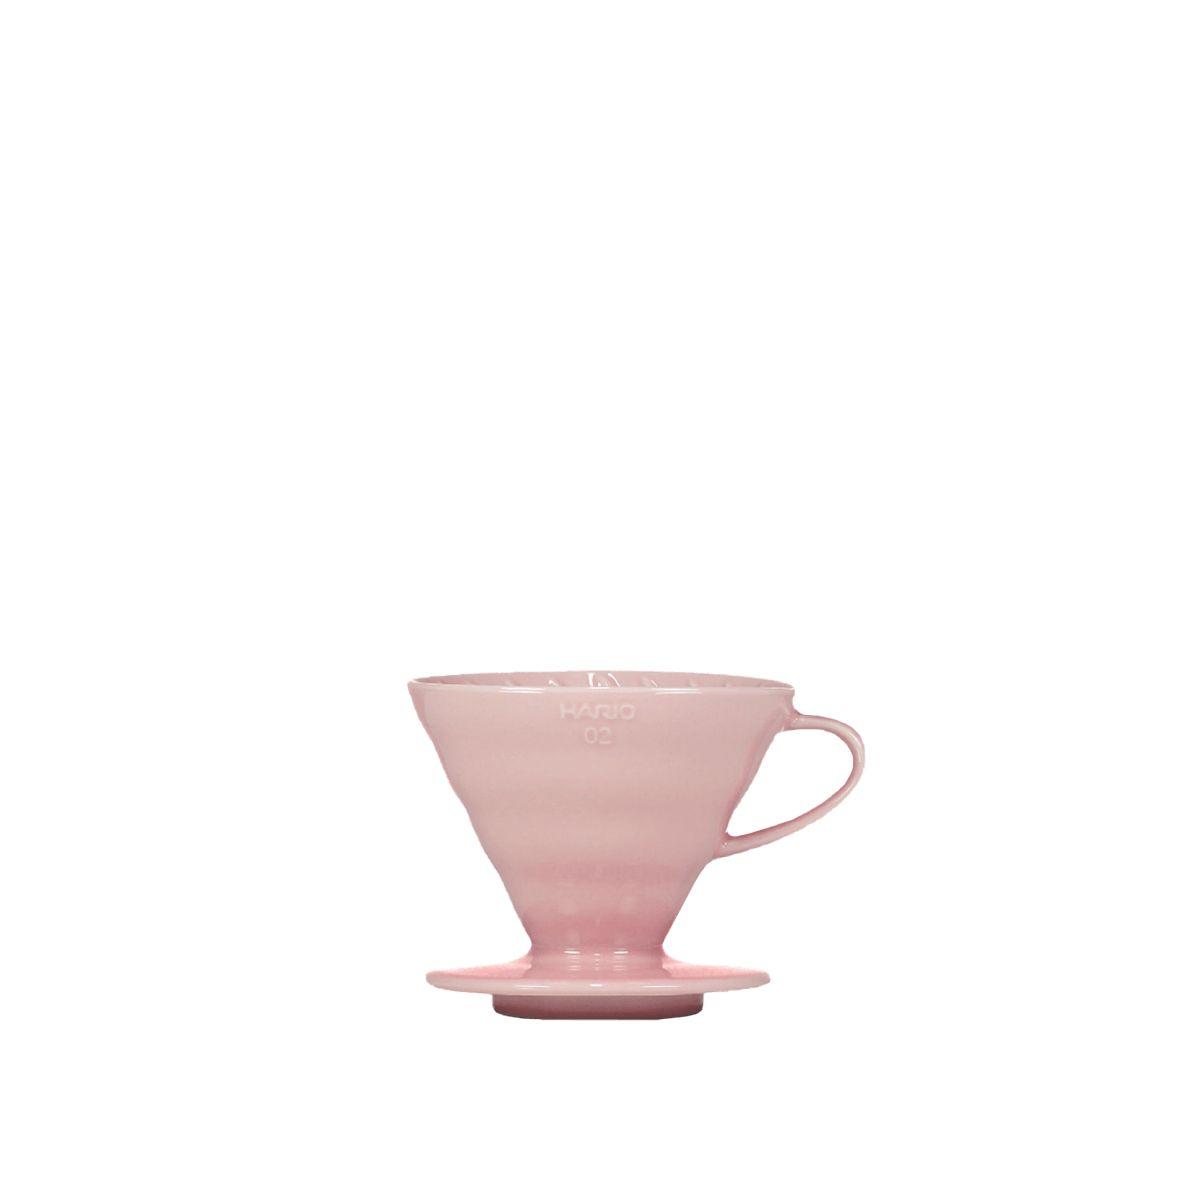 V60 Porcelain Dripper Hario [3/4 cups] - Pink